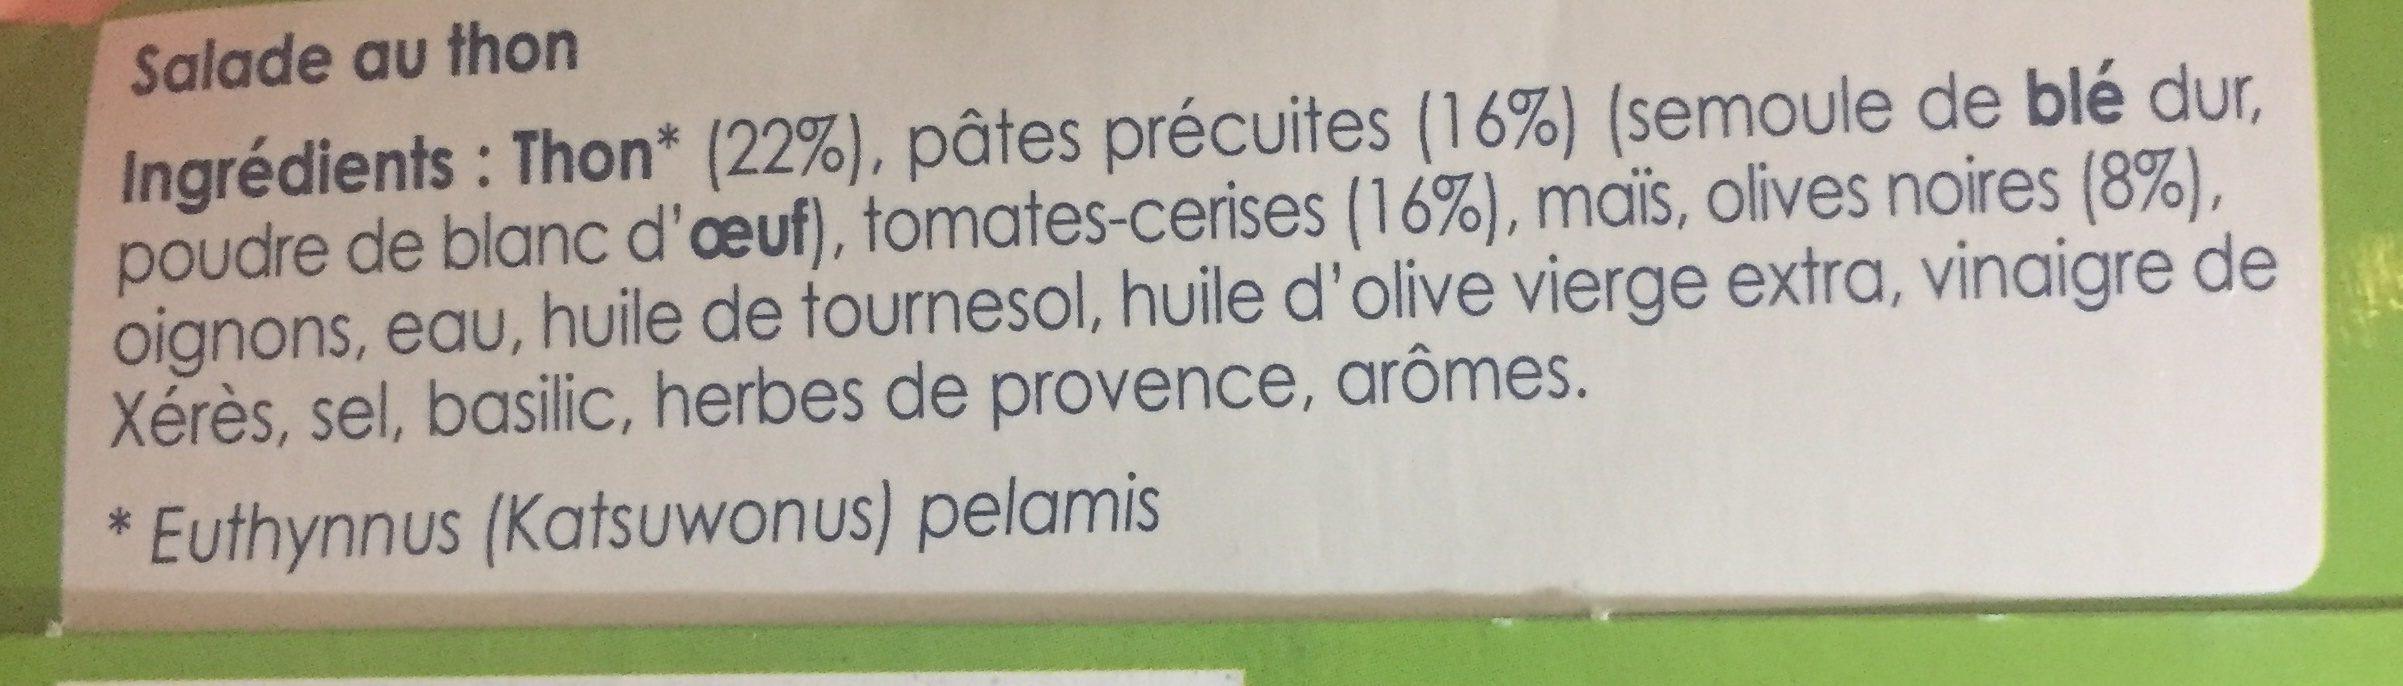 Salade Pasta Les Saladières - Ingrédients - fr